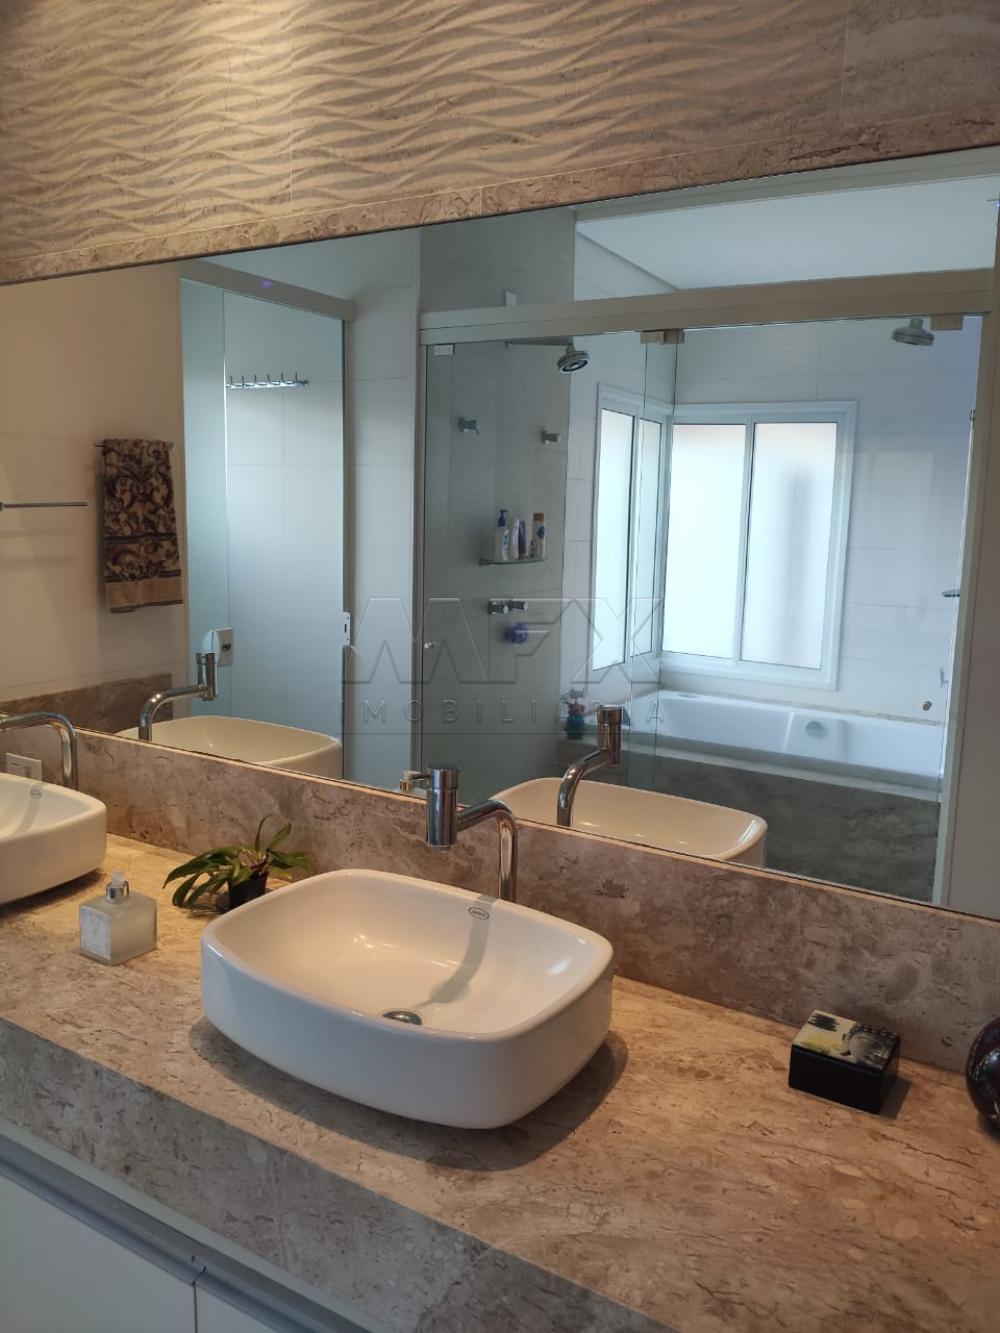 Comprar Casa / Condomínio em Bauru apenas R$ 1.800.000,00 - Foto 27